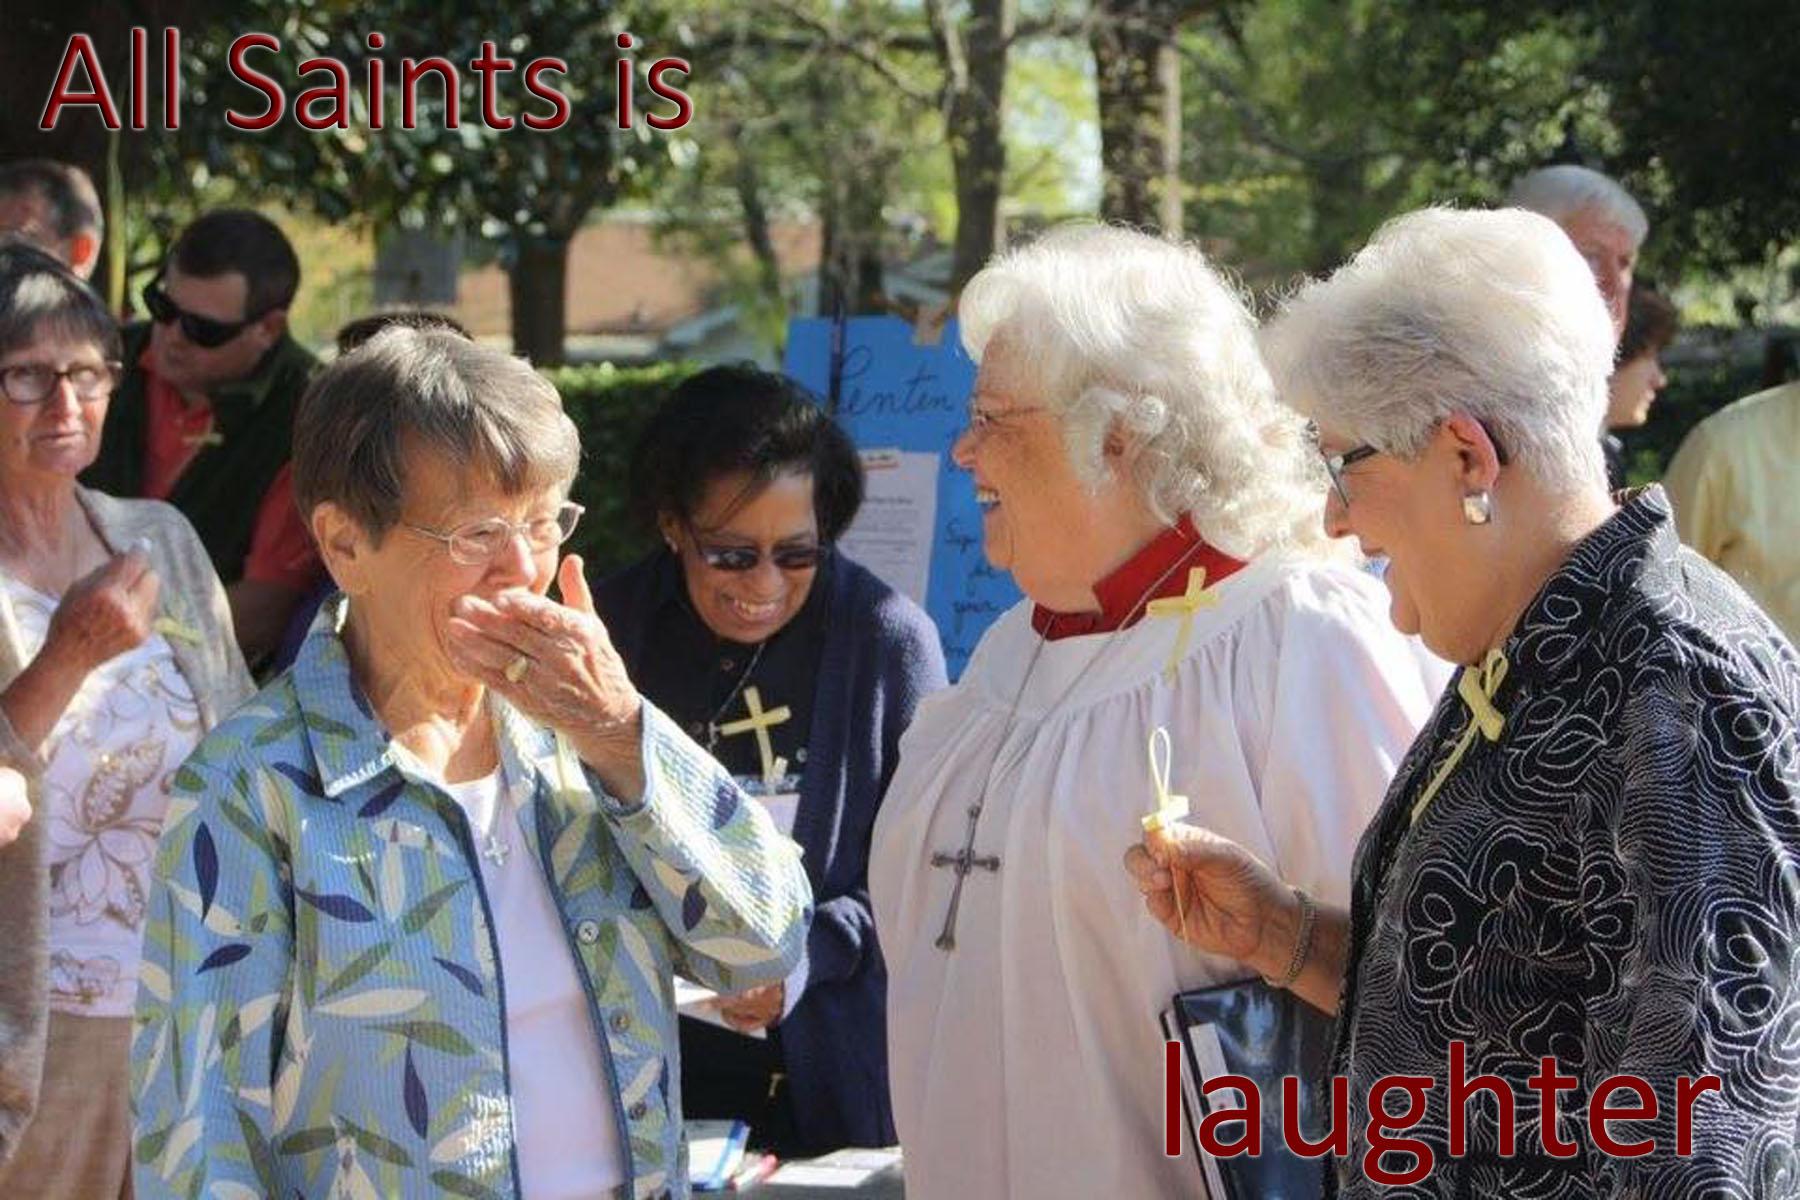 Laughterweb.jpg